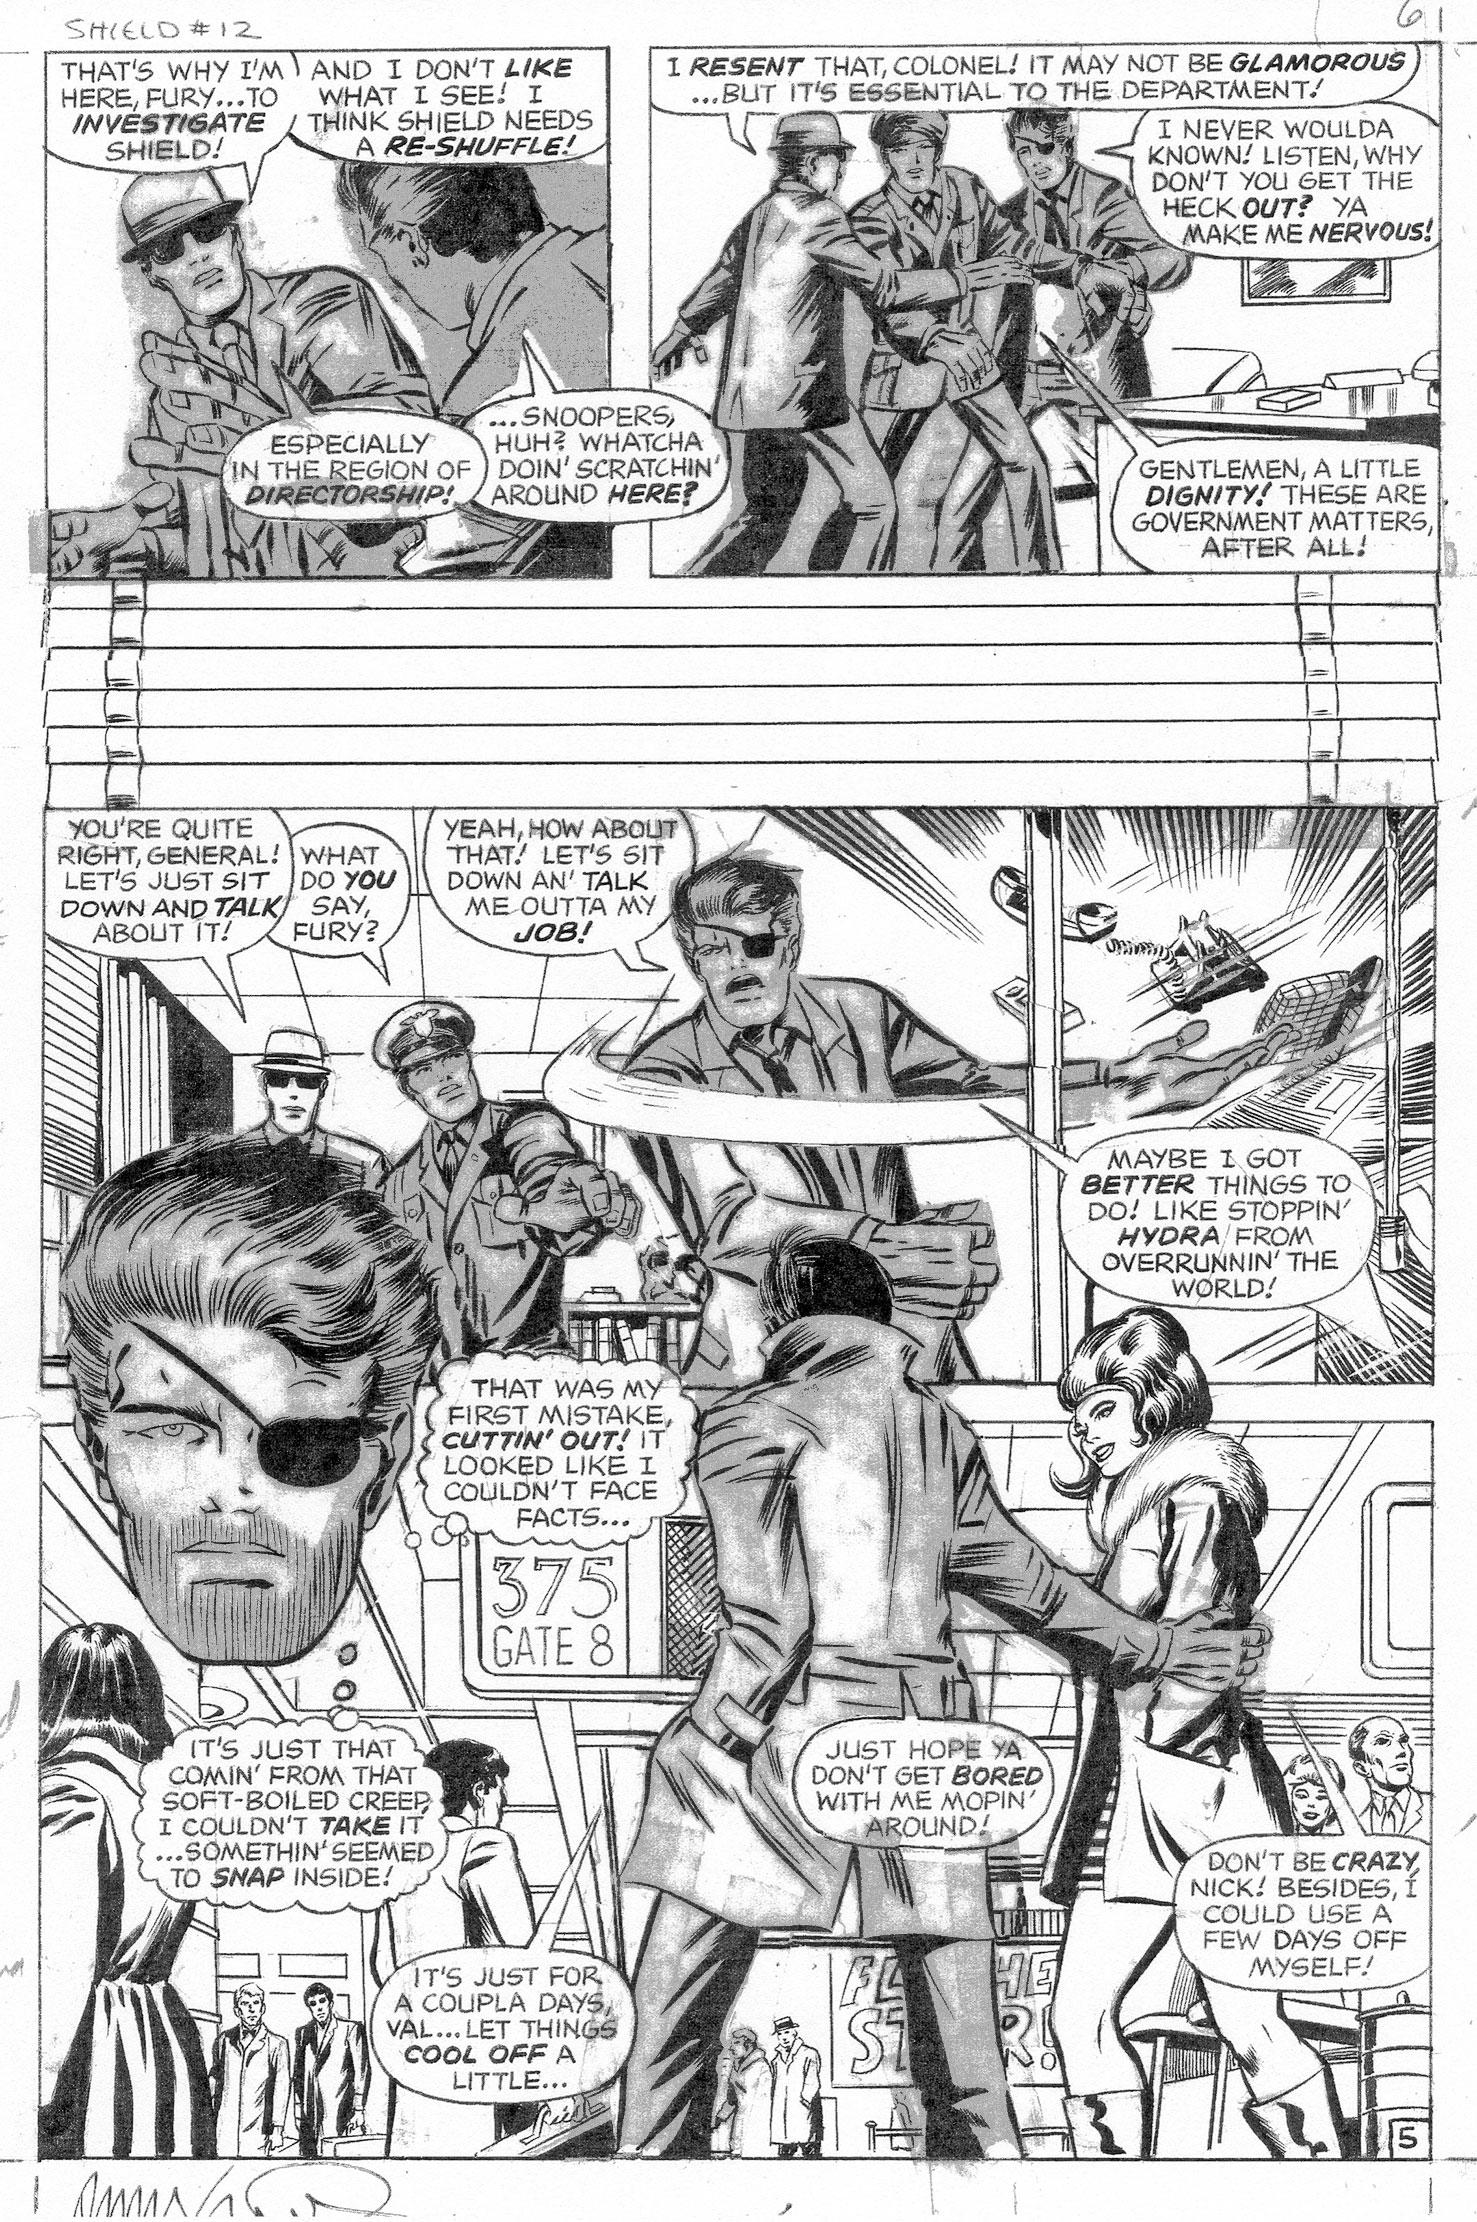 BARRY SMITH 1968 NICK FURY #12 P.5 Comic Art